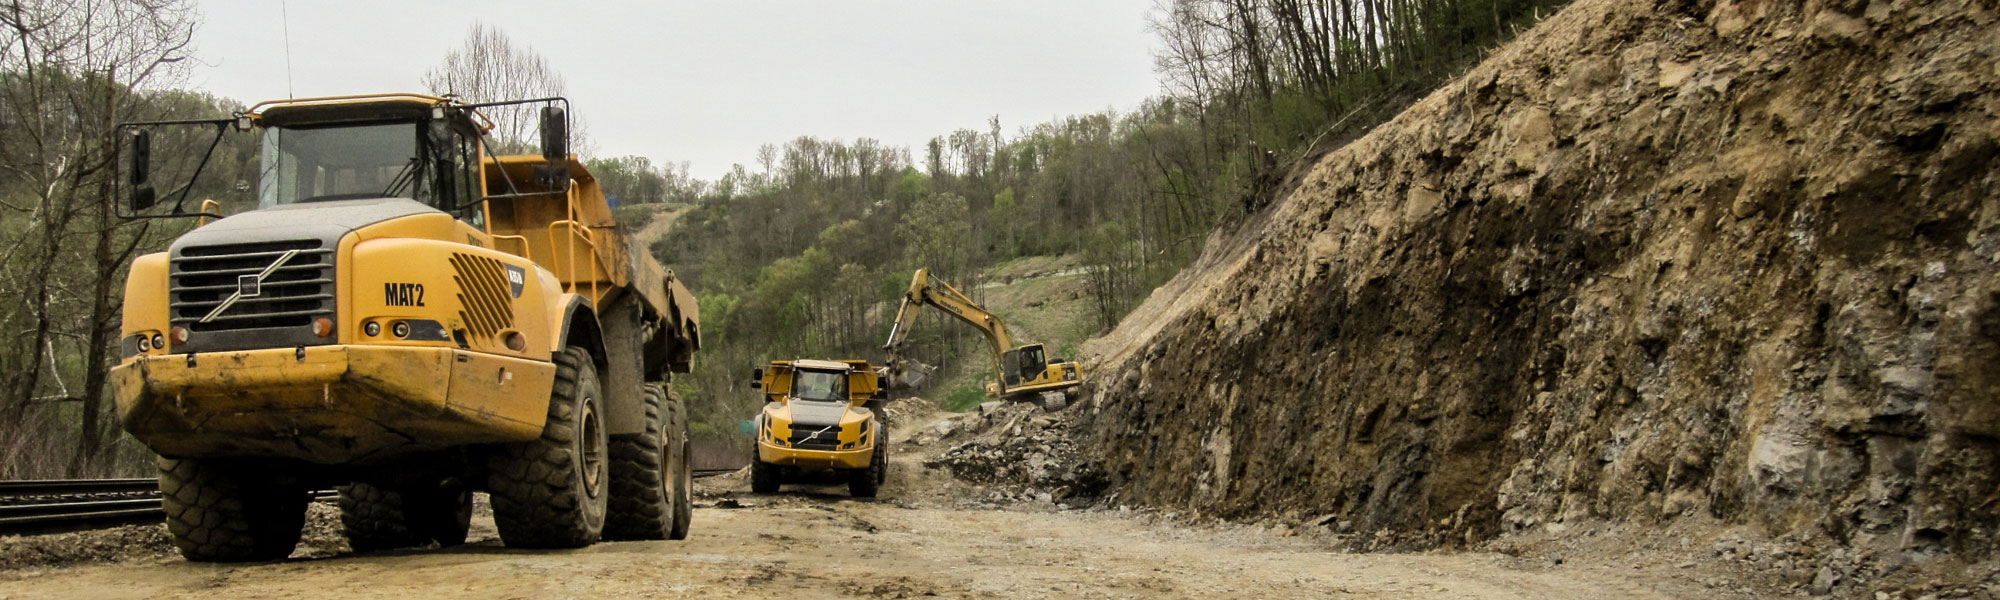 Heavy Equipment & Dump Trucks At Job Site